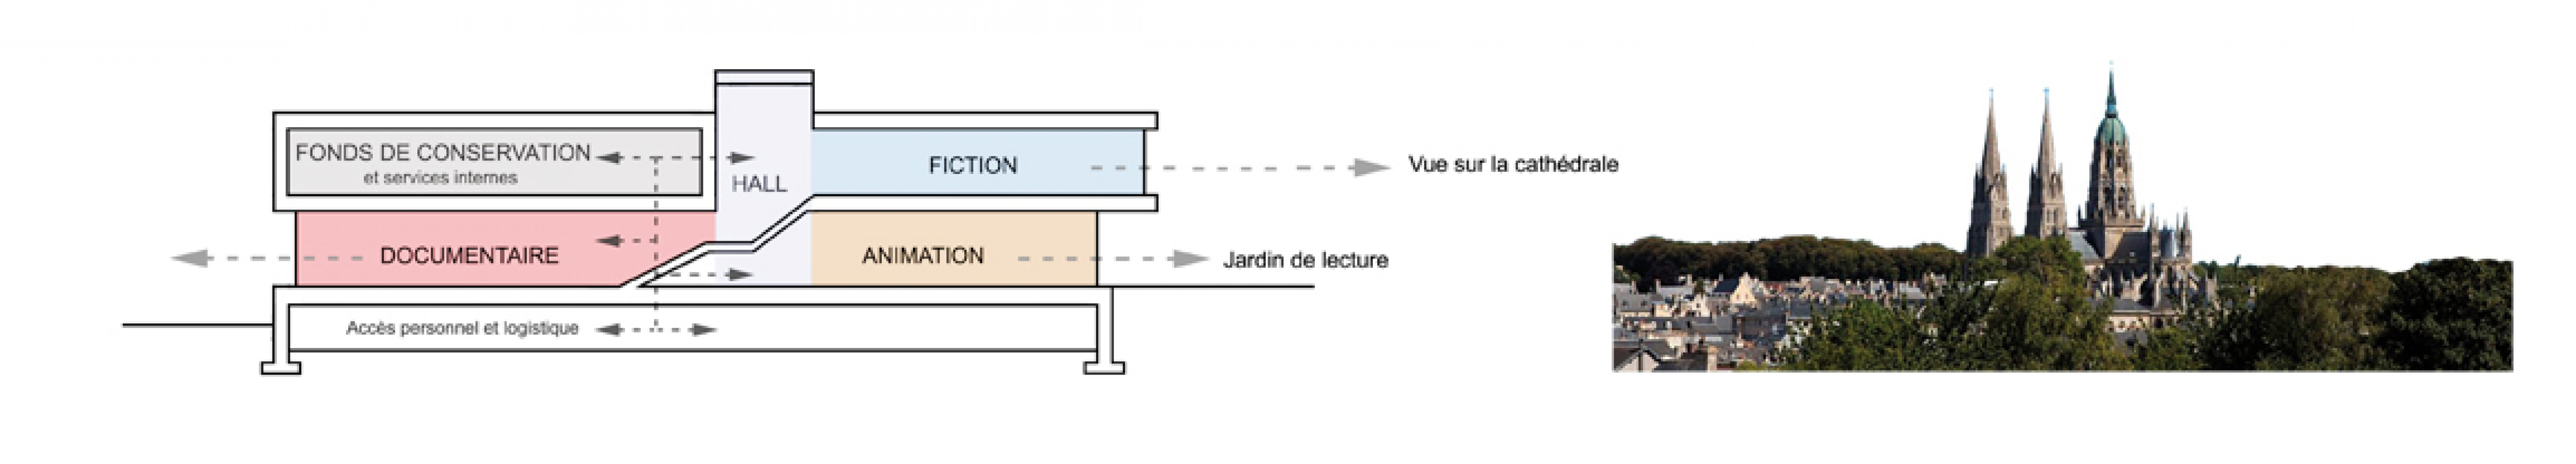 01-bayeux-img-003 Pascale SEURIN Architecte